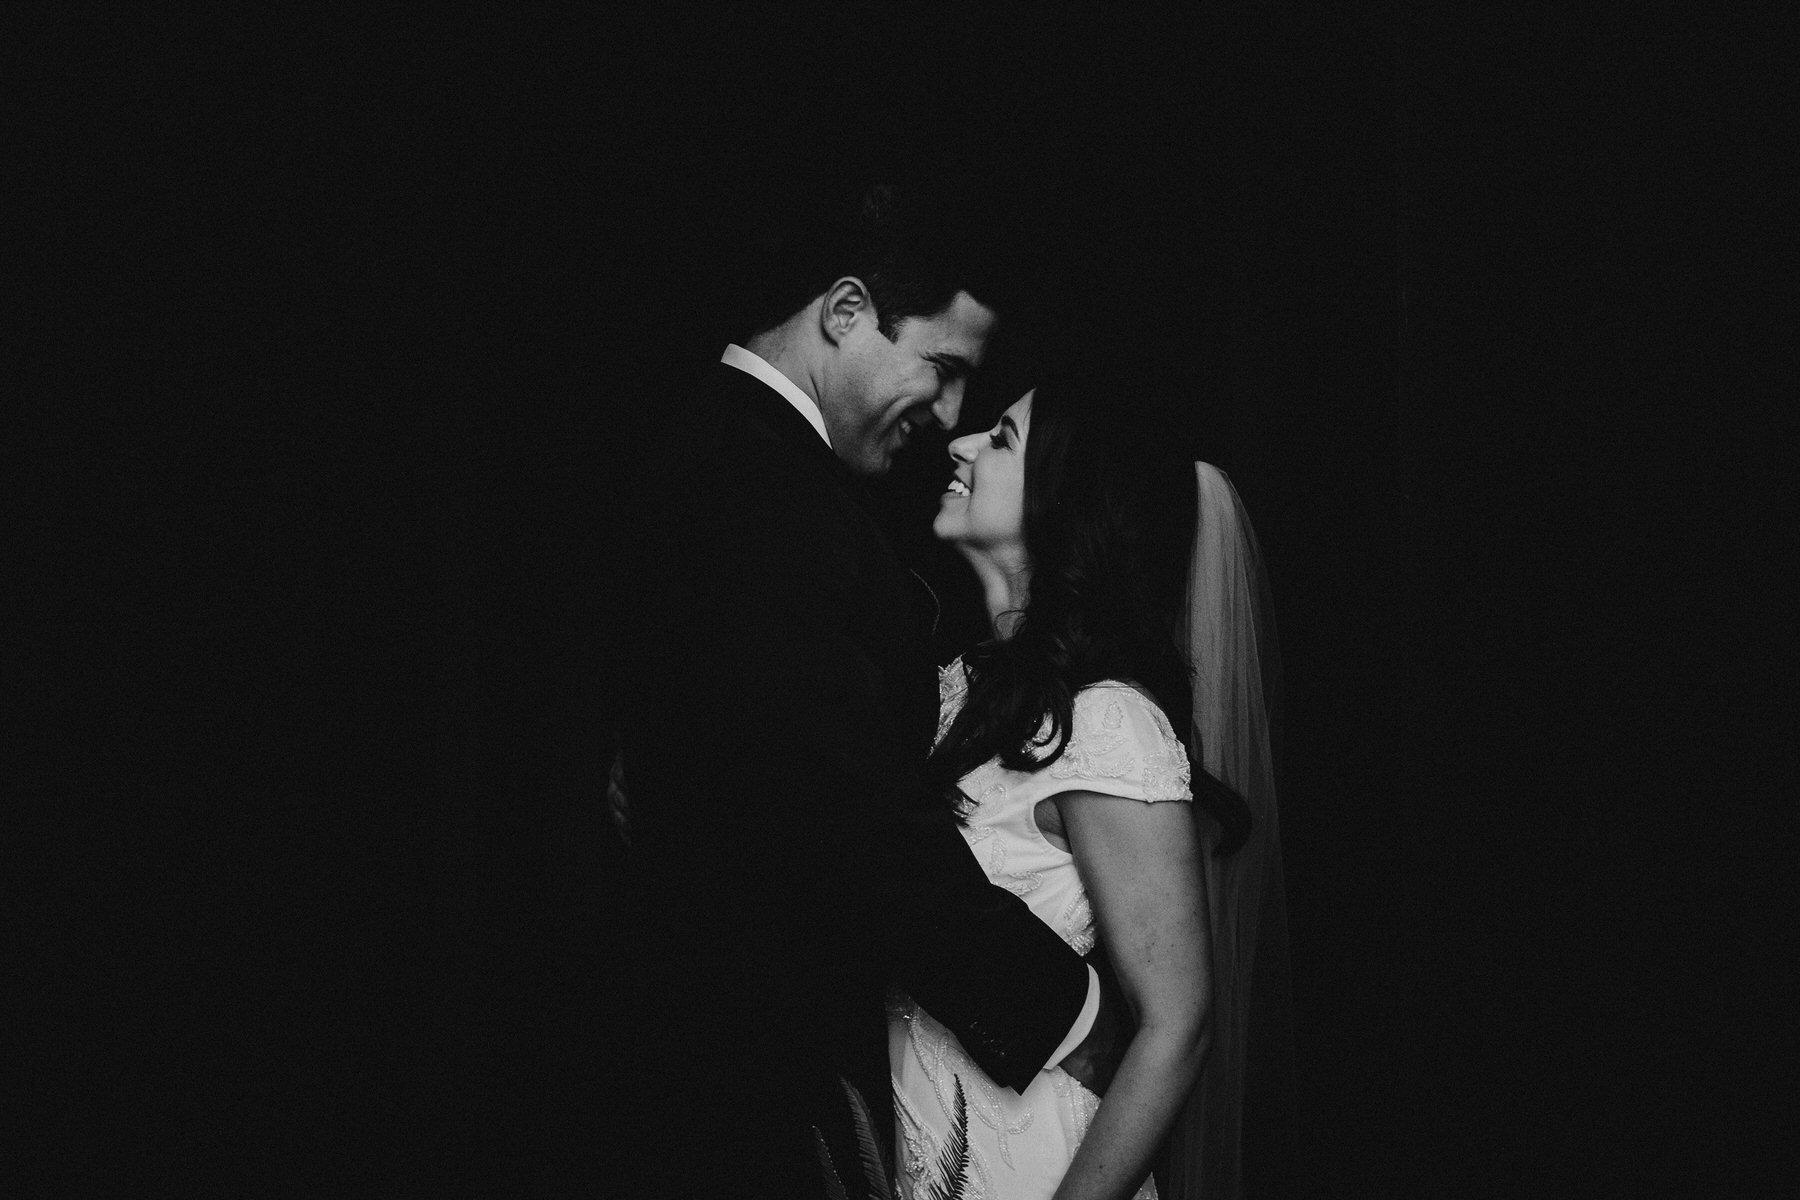 Oxford_mississippi_wedding_photographer_030.jpg